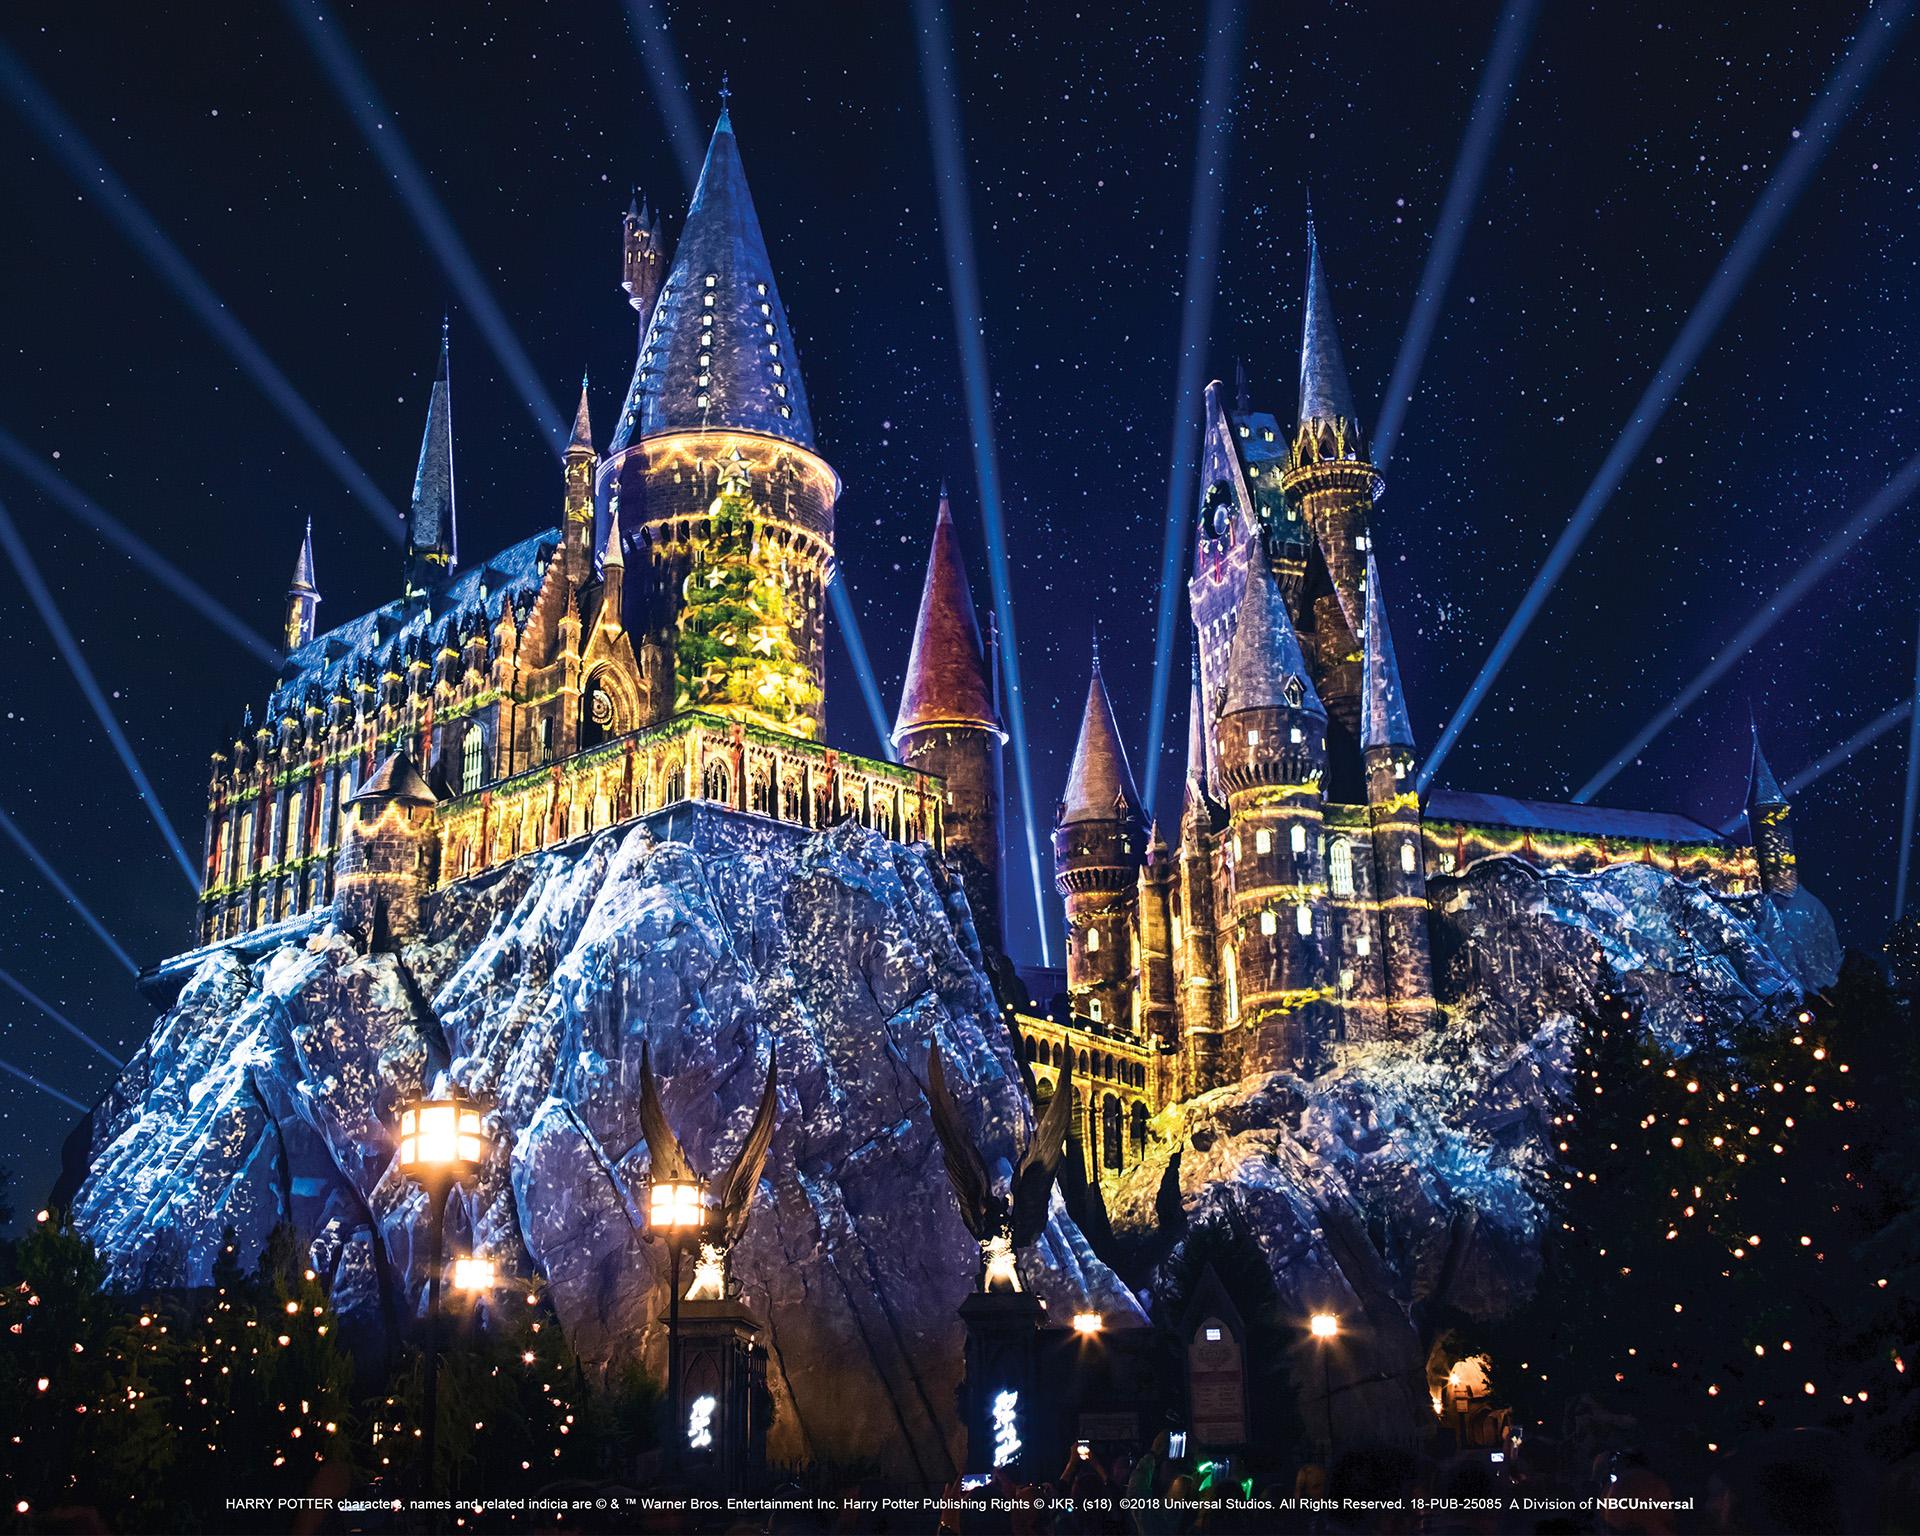 Harry Potter Christmas Ornaments Universal Studios.Universal Studios Hollywood Announces 2018 Holiday Season